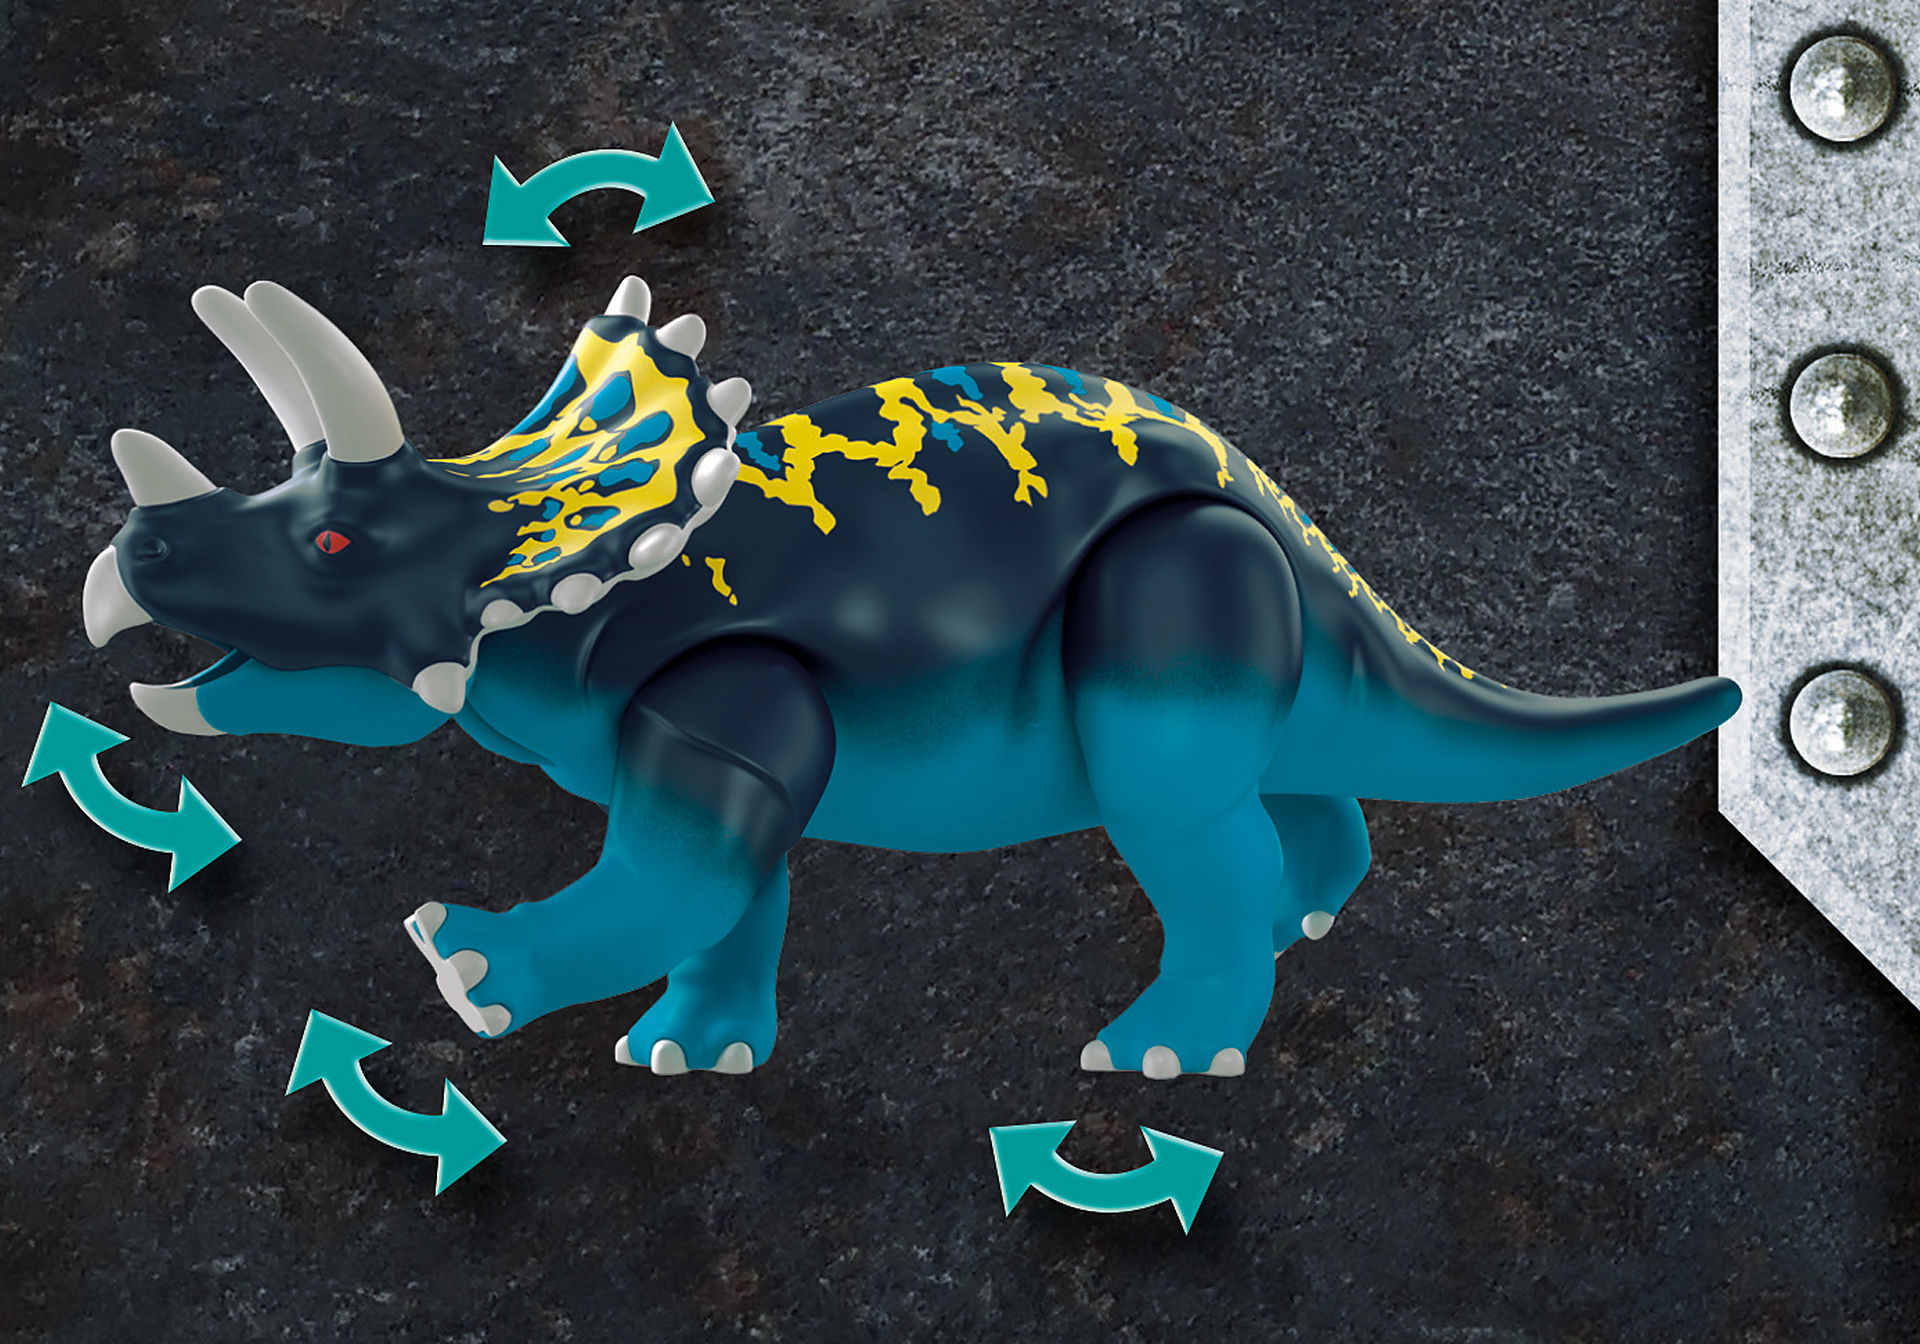 70627 Triceraptos: Disturbios por las piedras legendarias zoom image4